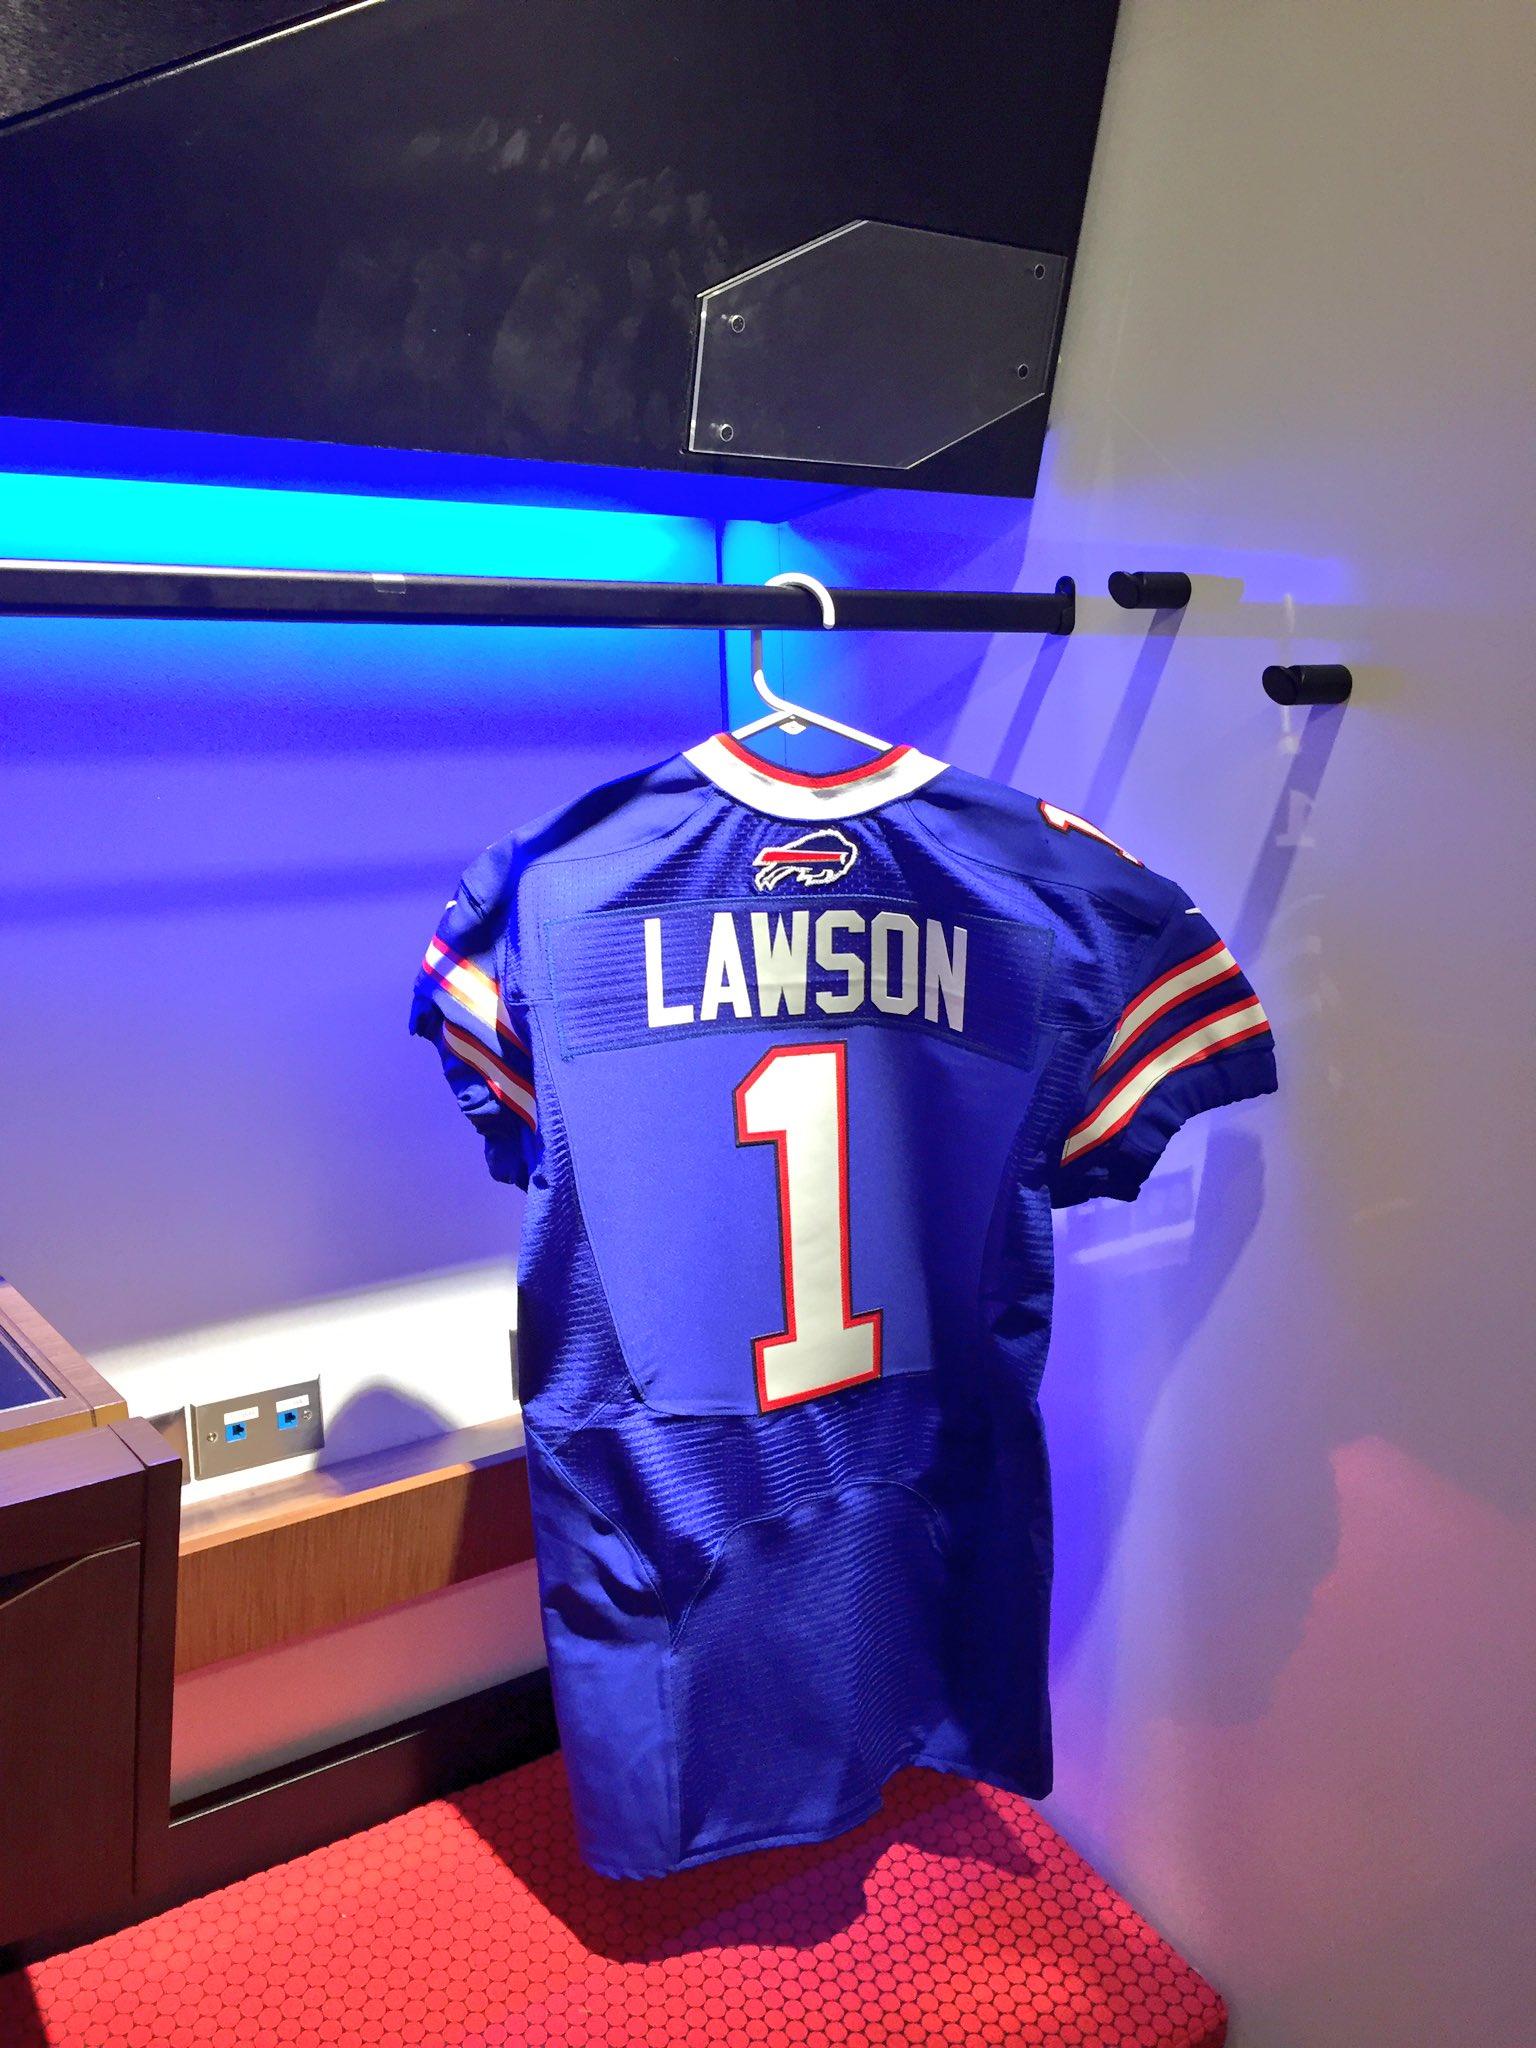 Welcome to Buffalo @Shaq_Lawson90 Go #Bills https://t.co/mfBP2cb9Gw